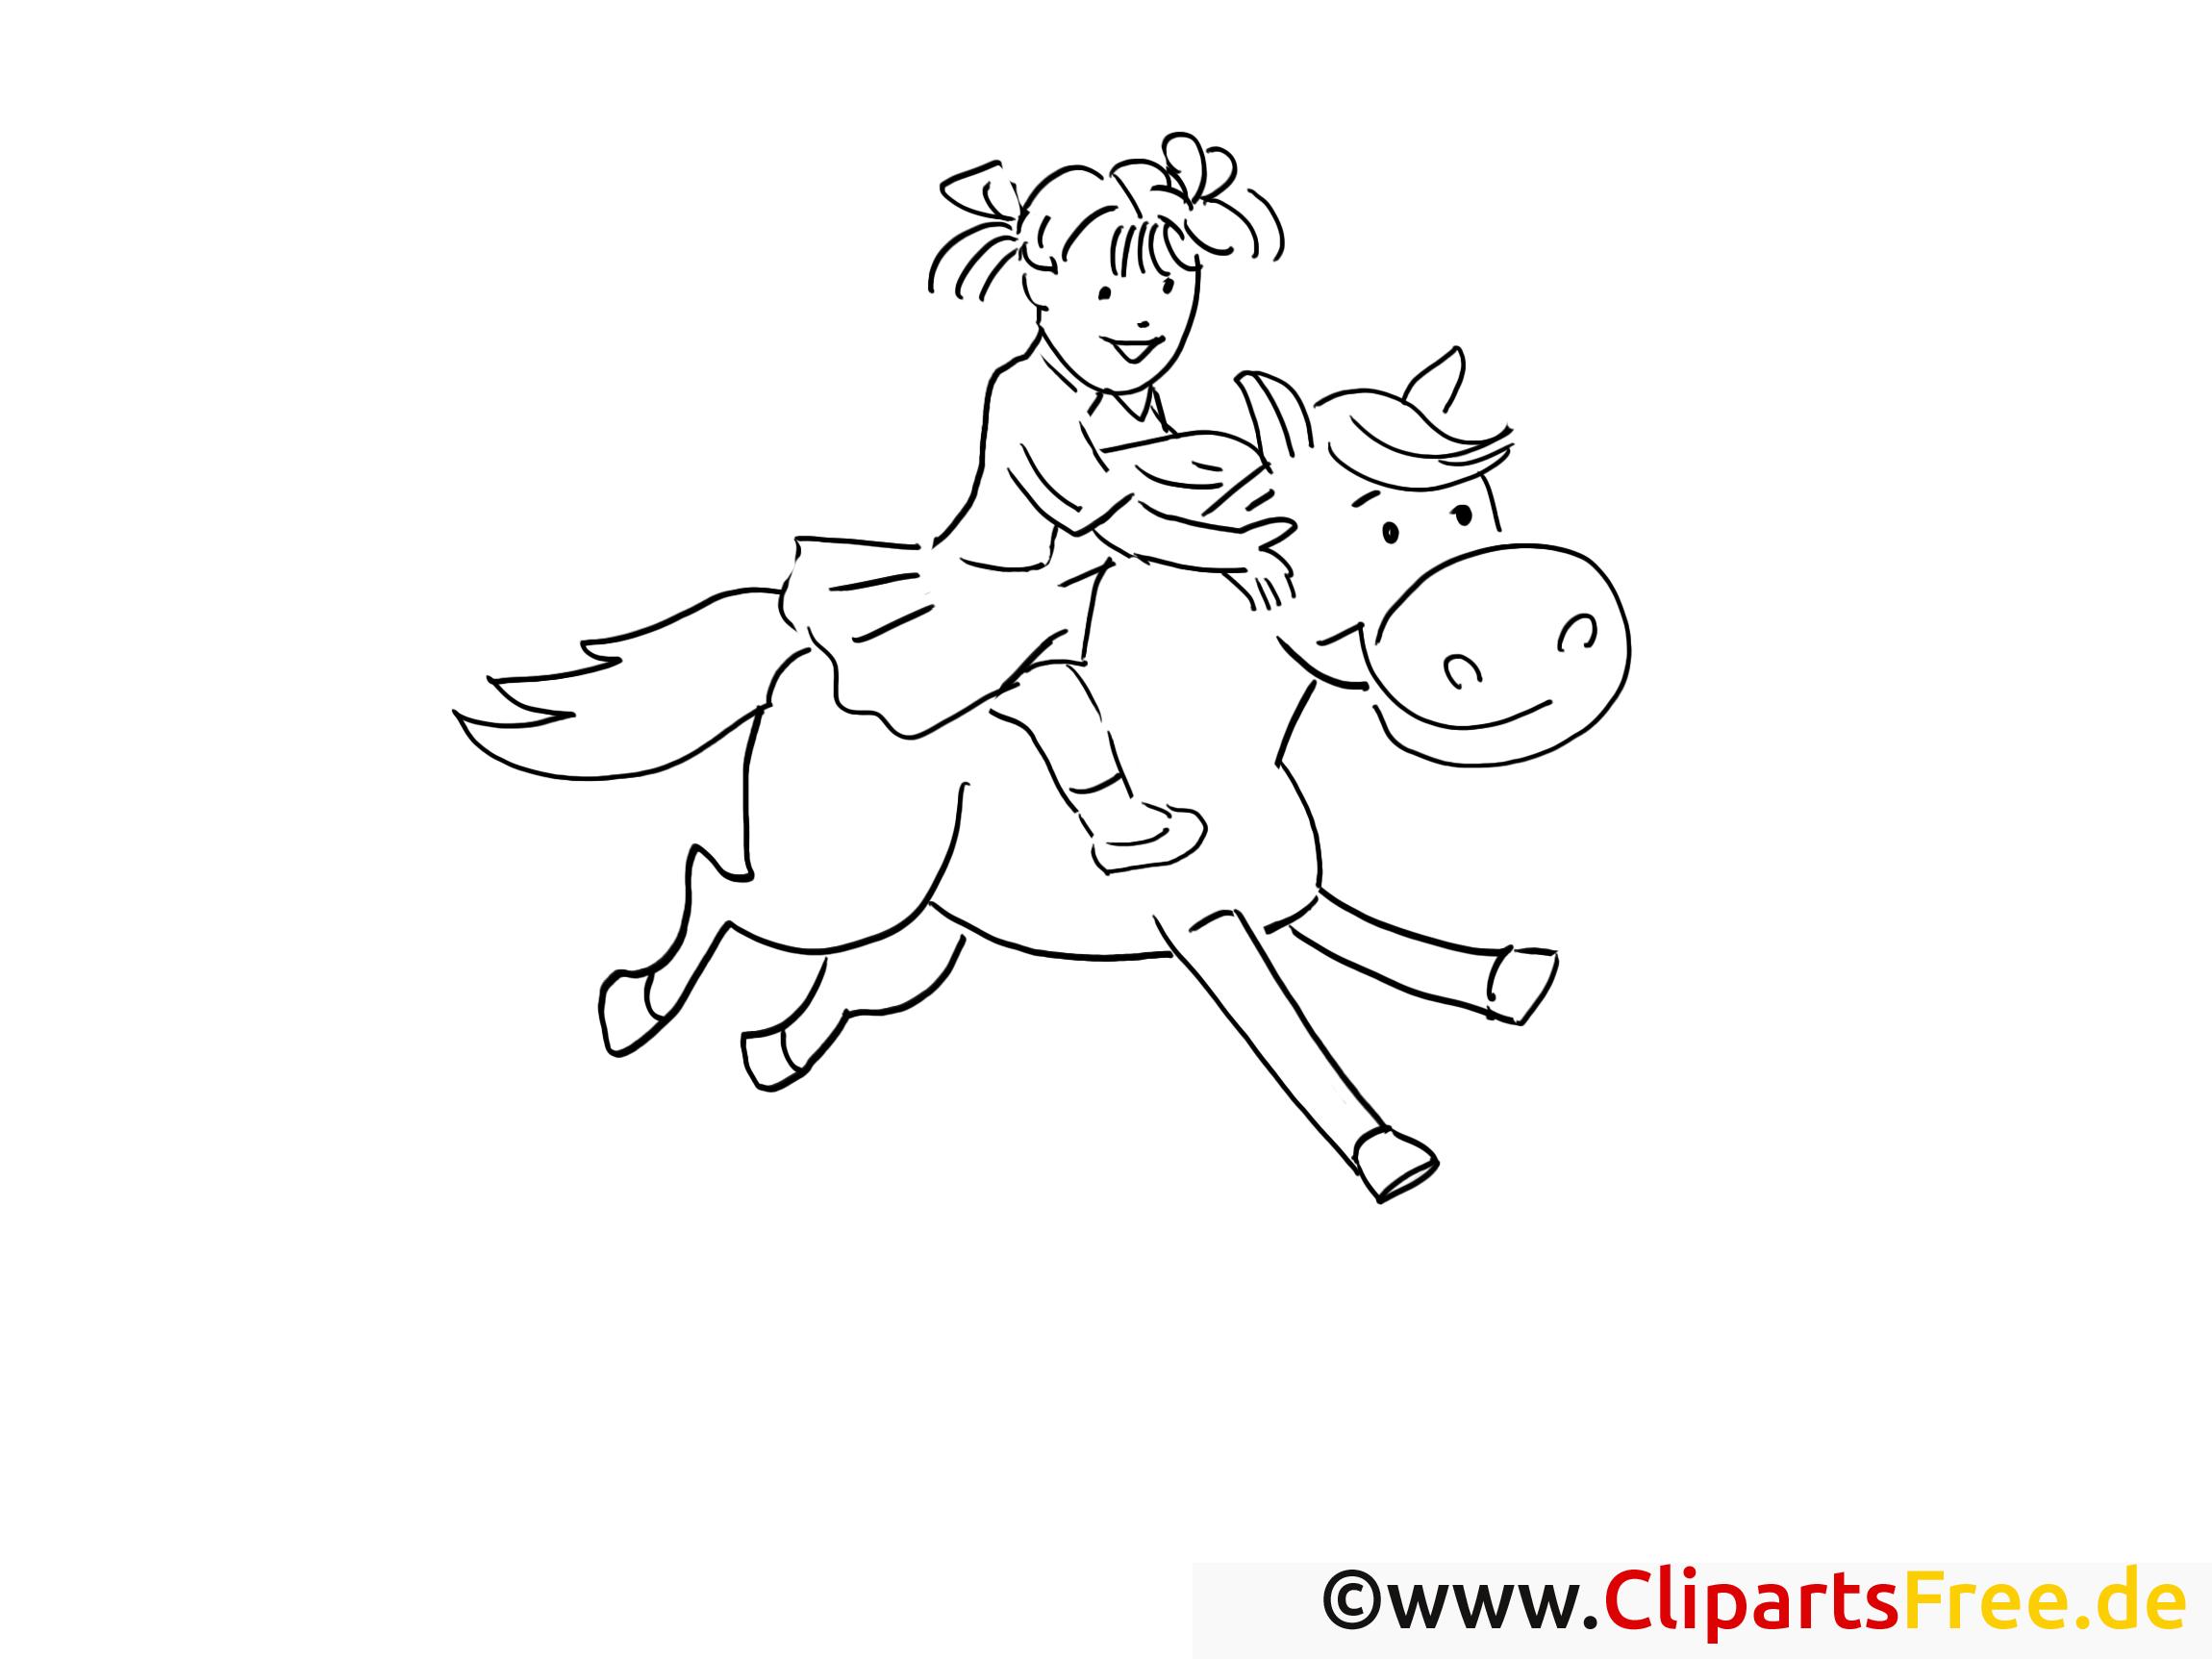 Cavalière illustration – Campagne à imprimer